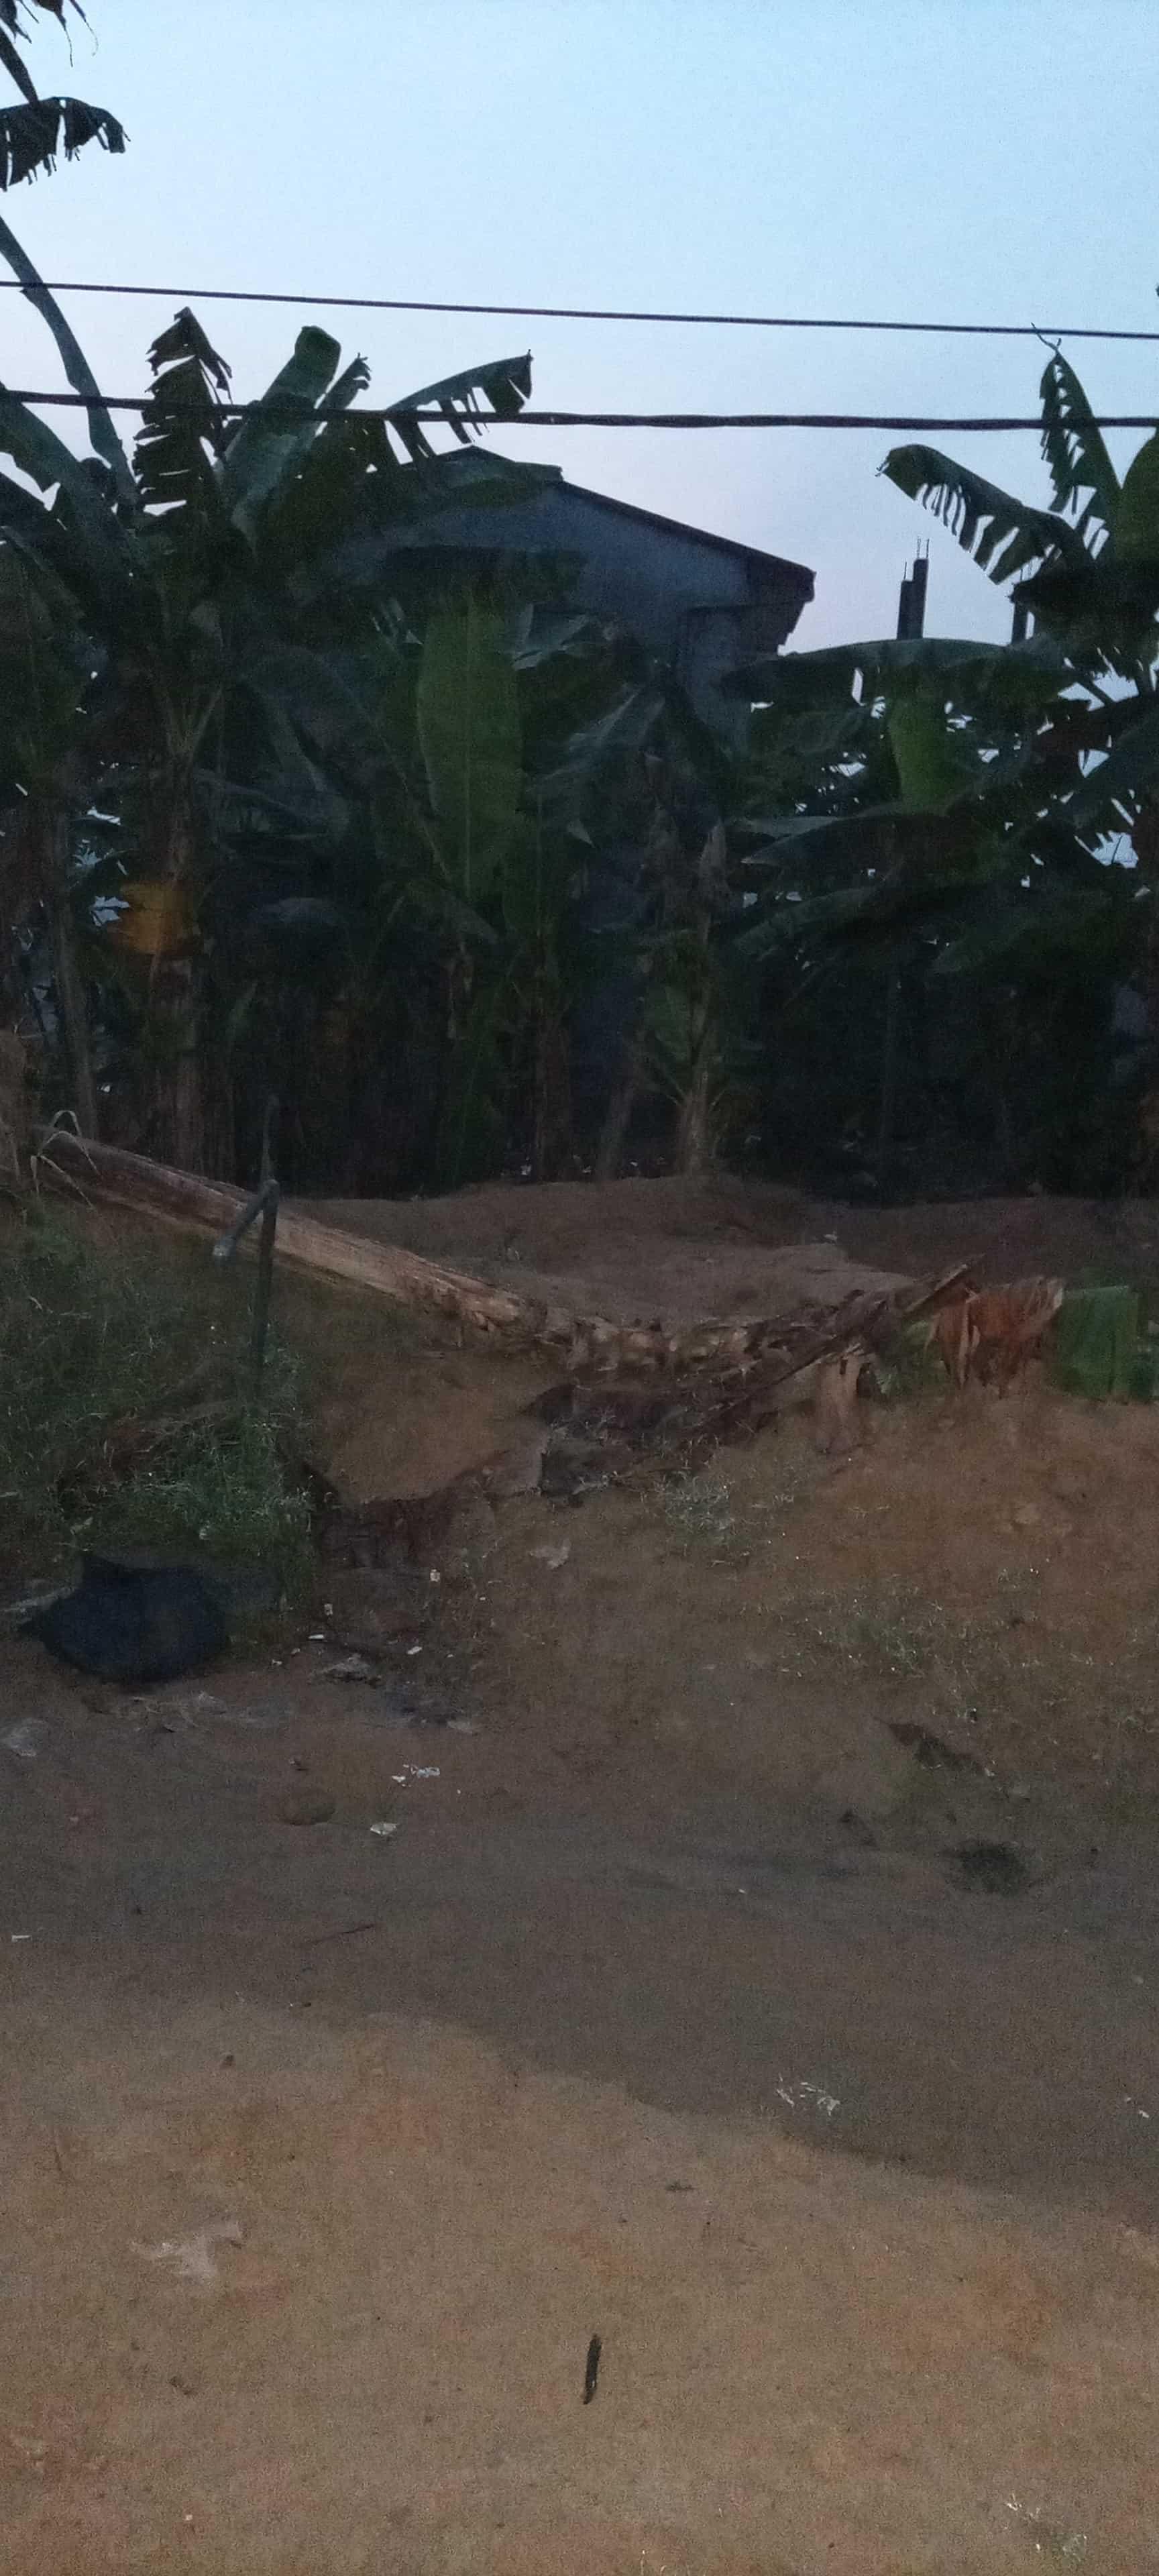 Land for sale at Douala, Logbaba, Ver Bocom - 400 m2 - 16 000 000 FCFA